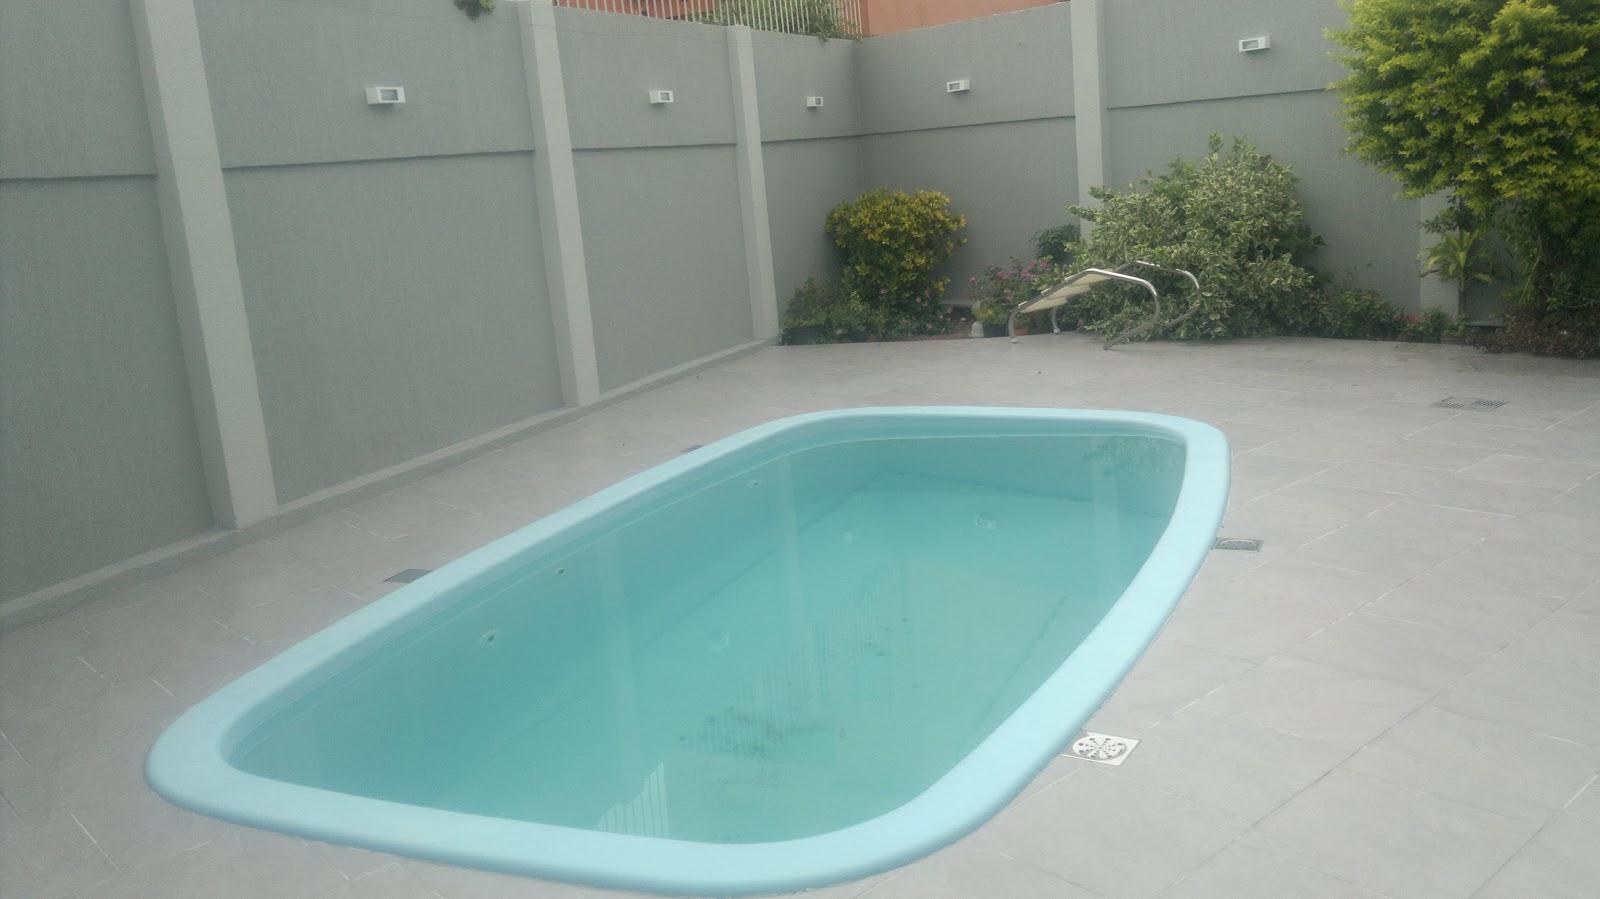 Jr renovando abril 2012 for Pintado de piscinas